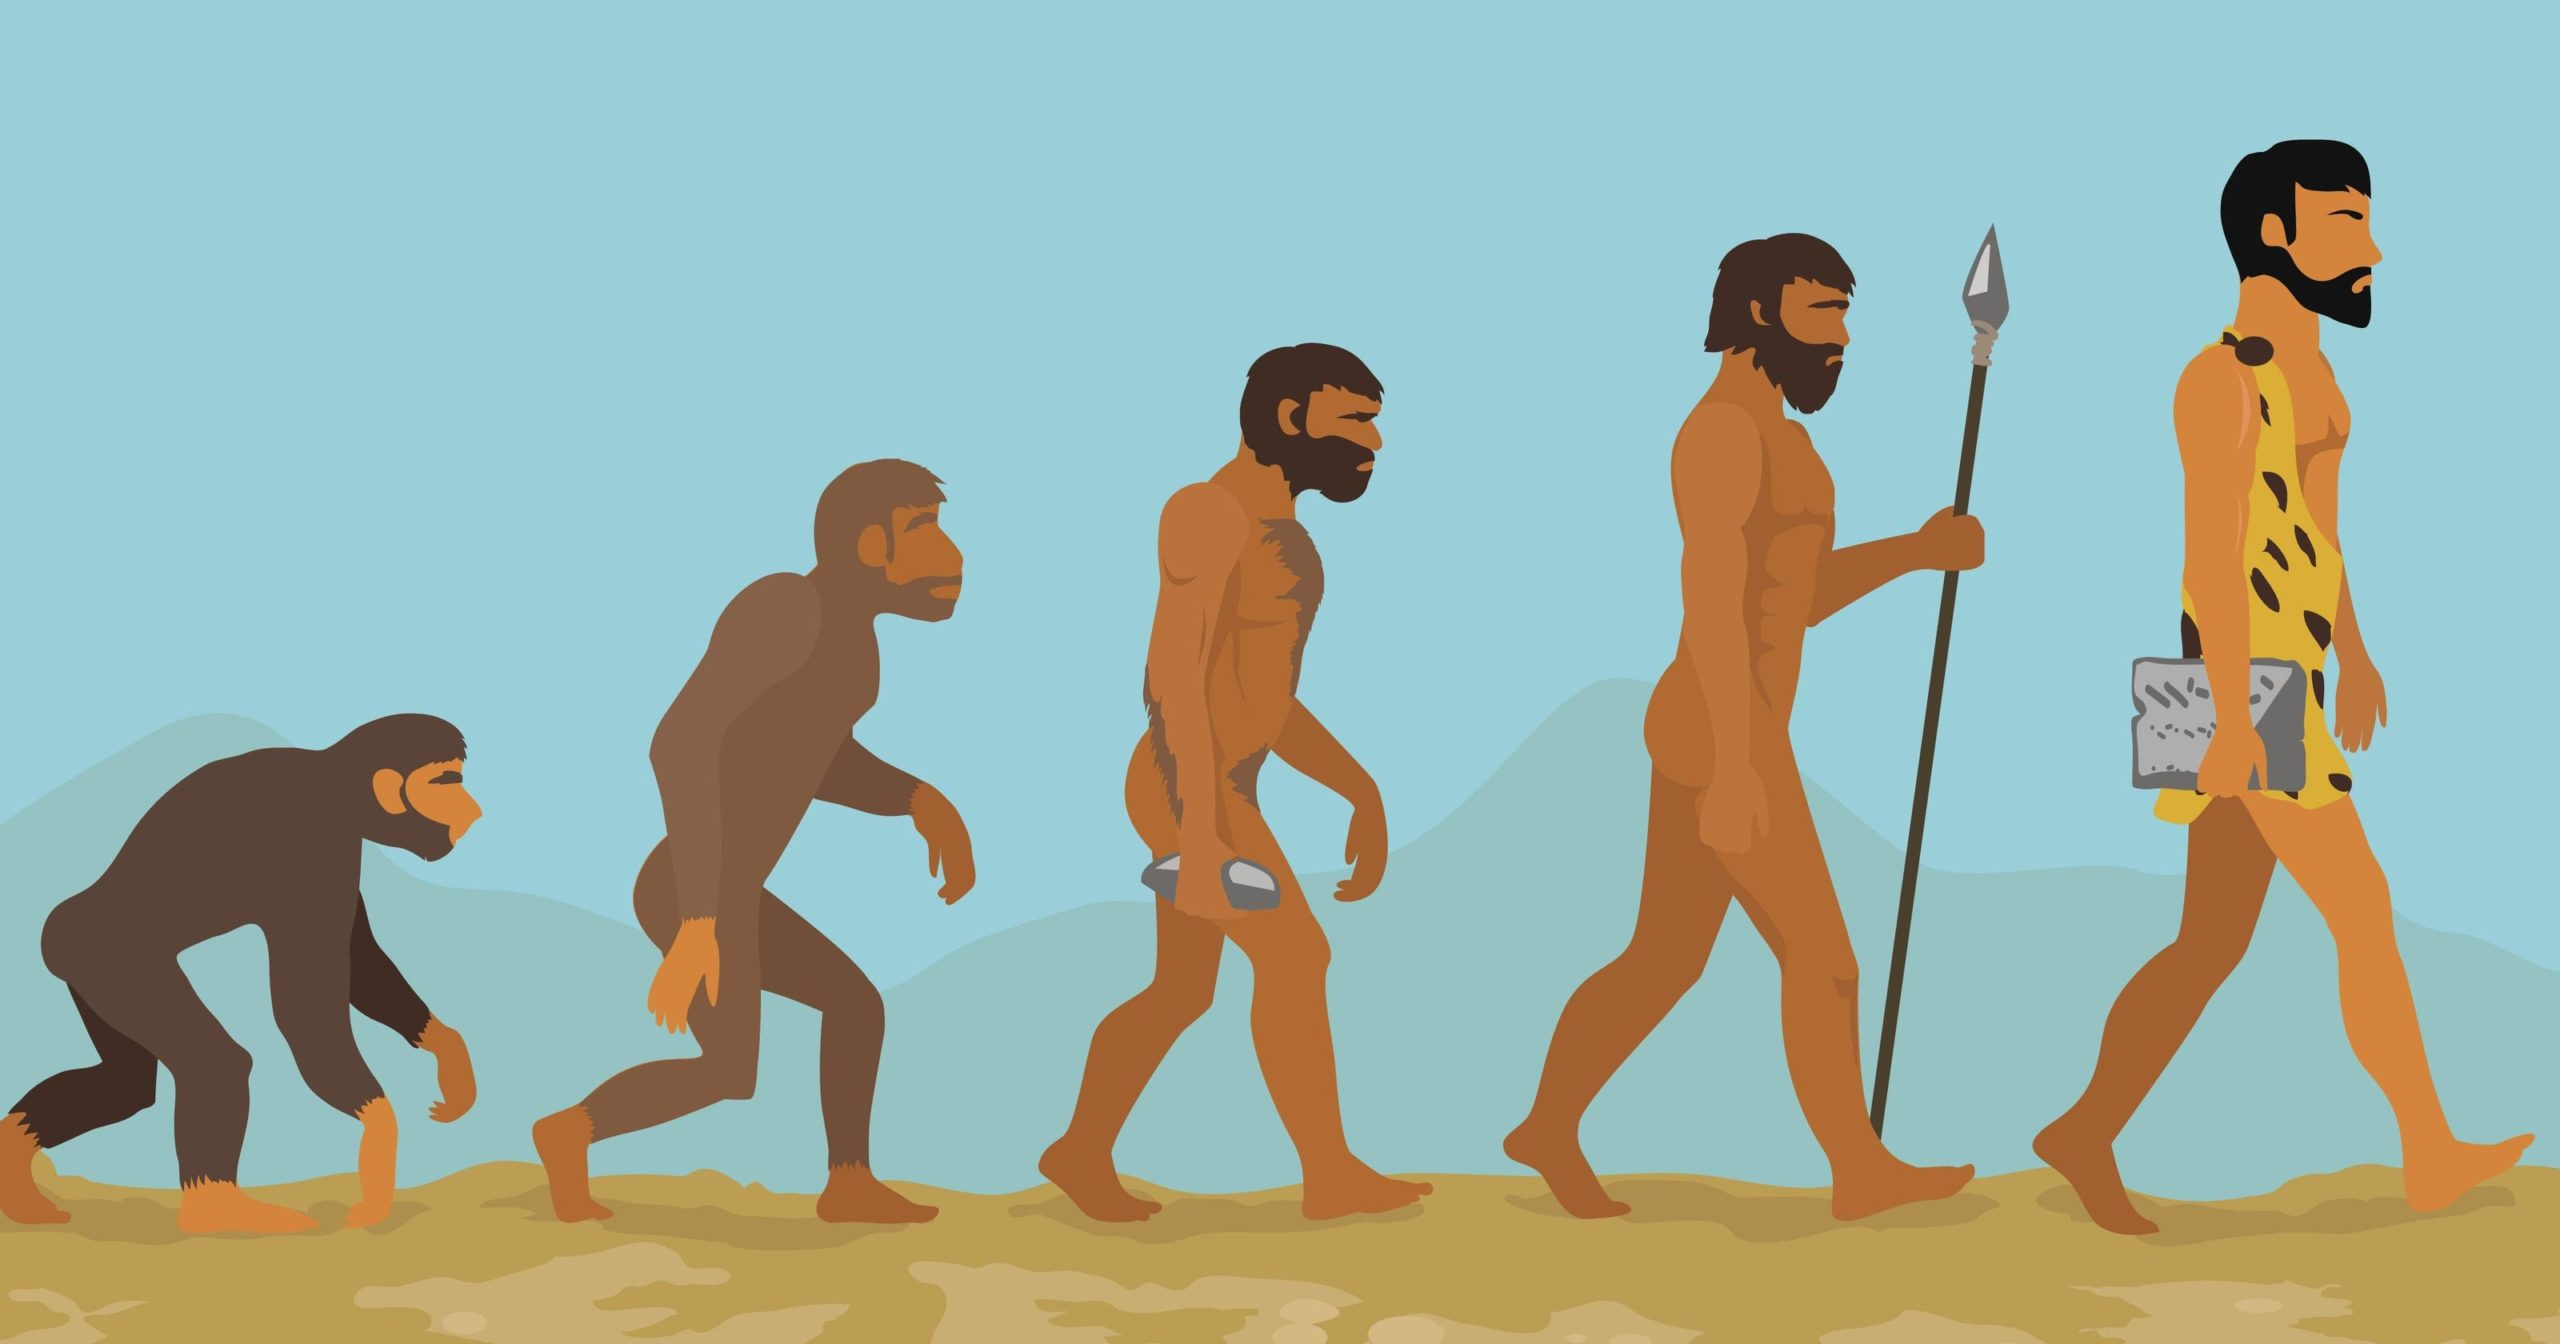 Evolutia omului – Momentele care au modelat viata moderna